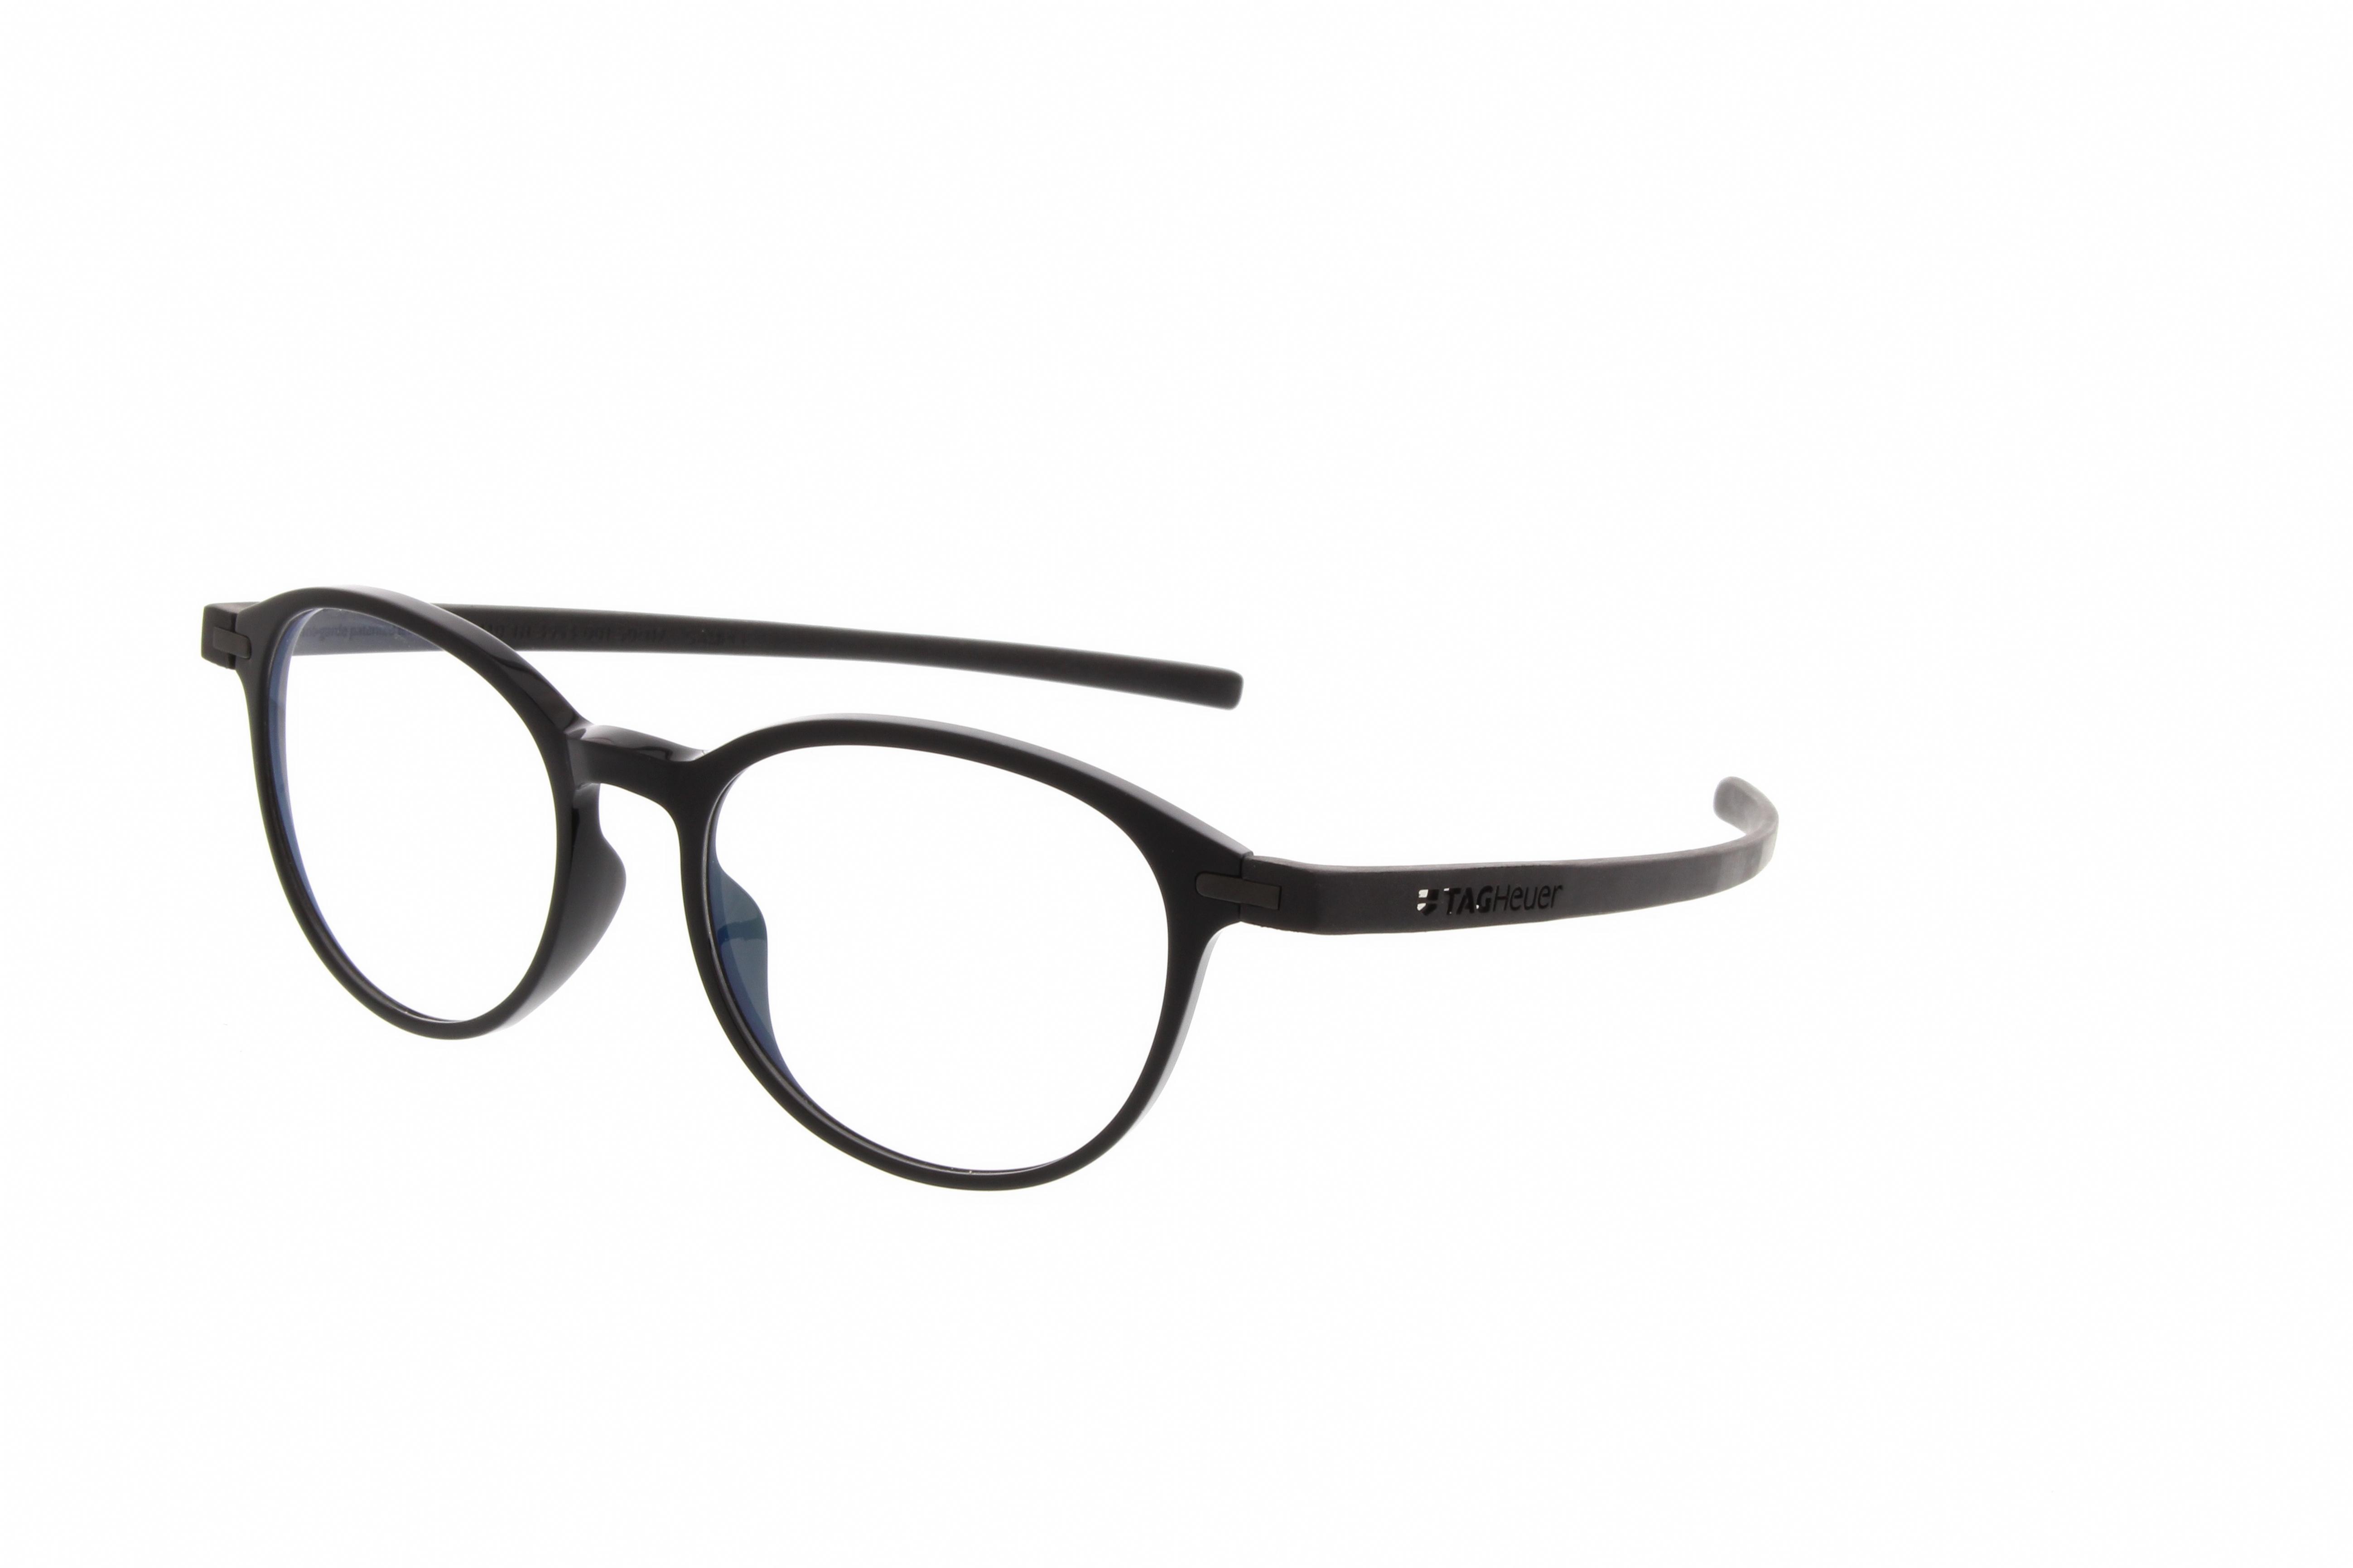 f3971d5682 Tag Heuer 3953 Reflex 3 Acetate Eyeglasses